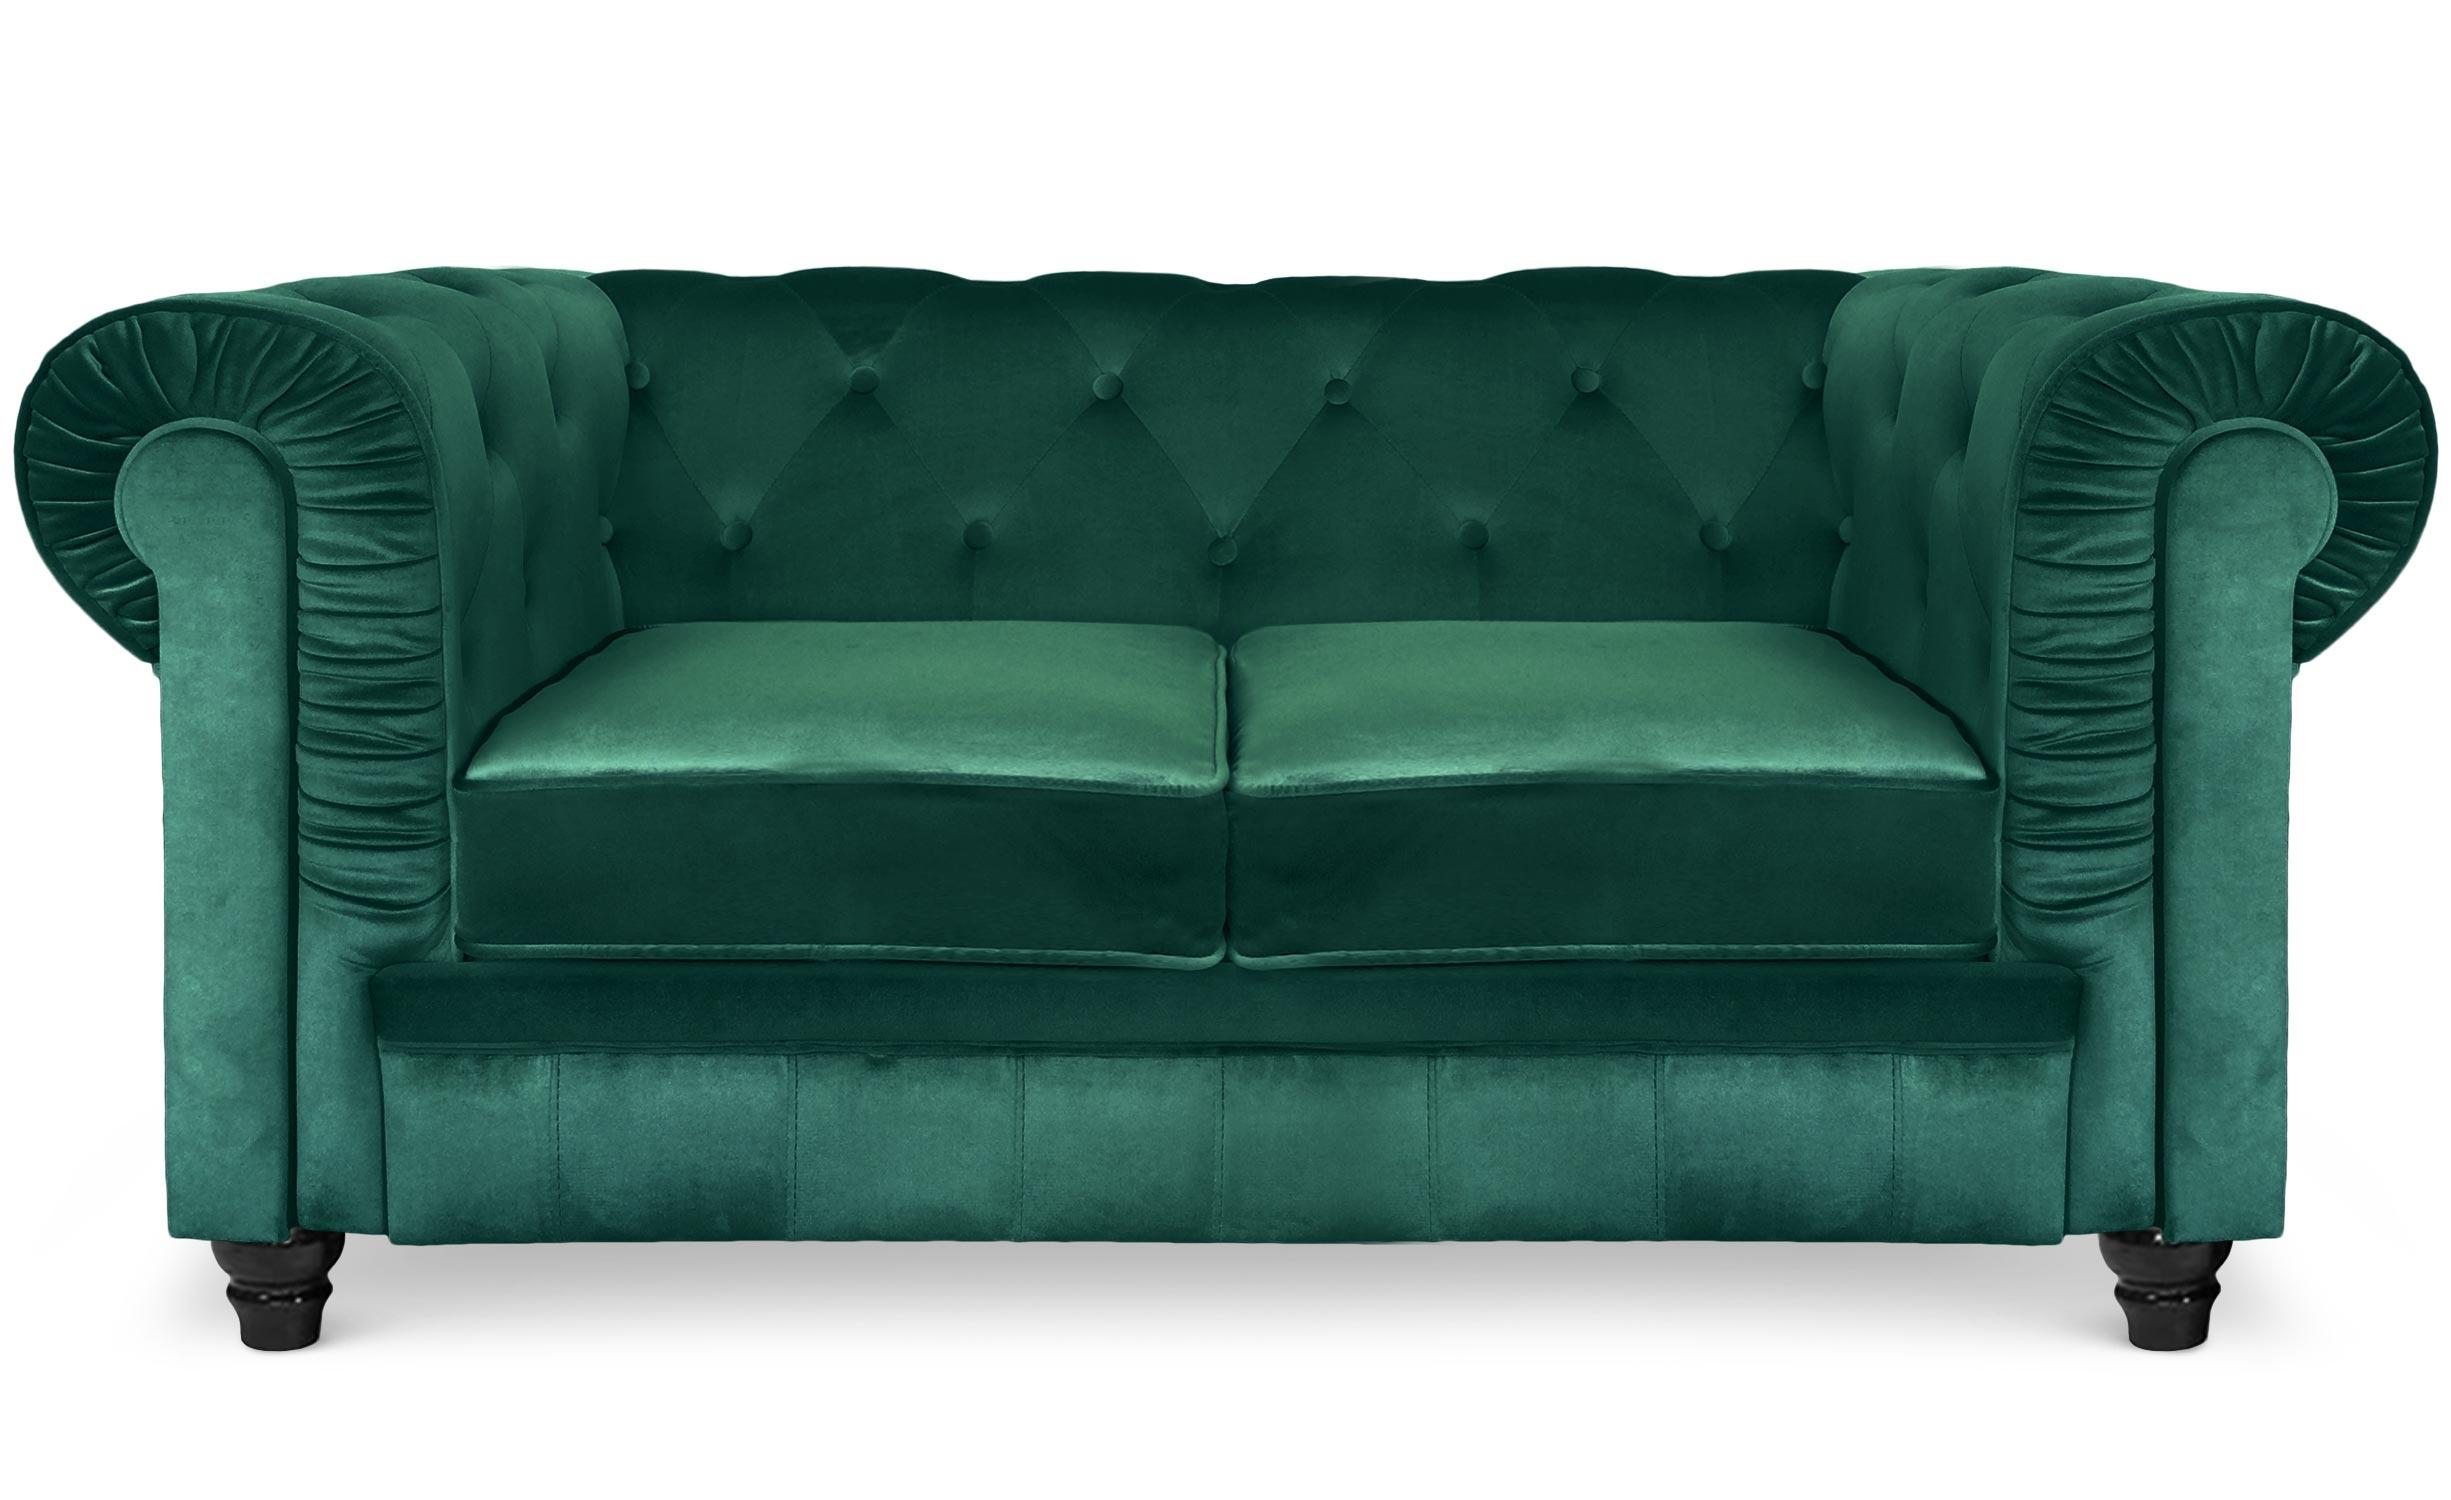 Grand canapé 2 places Chesterfield Velours Vert